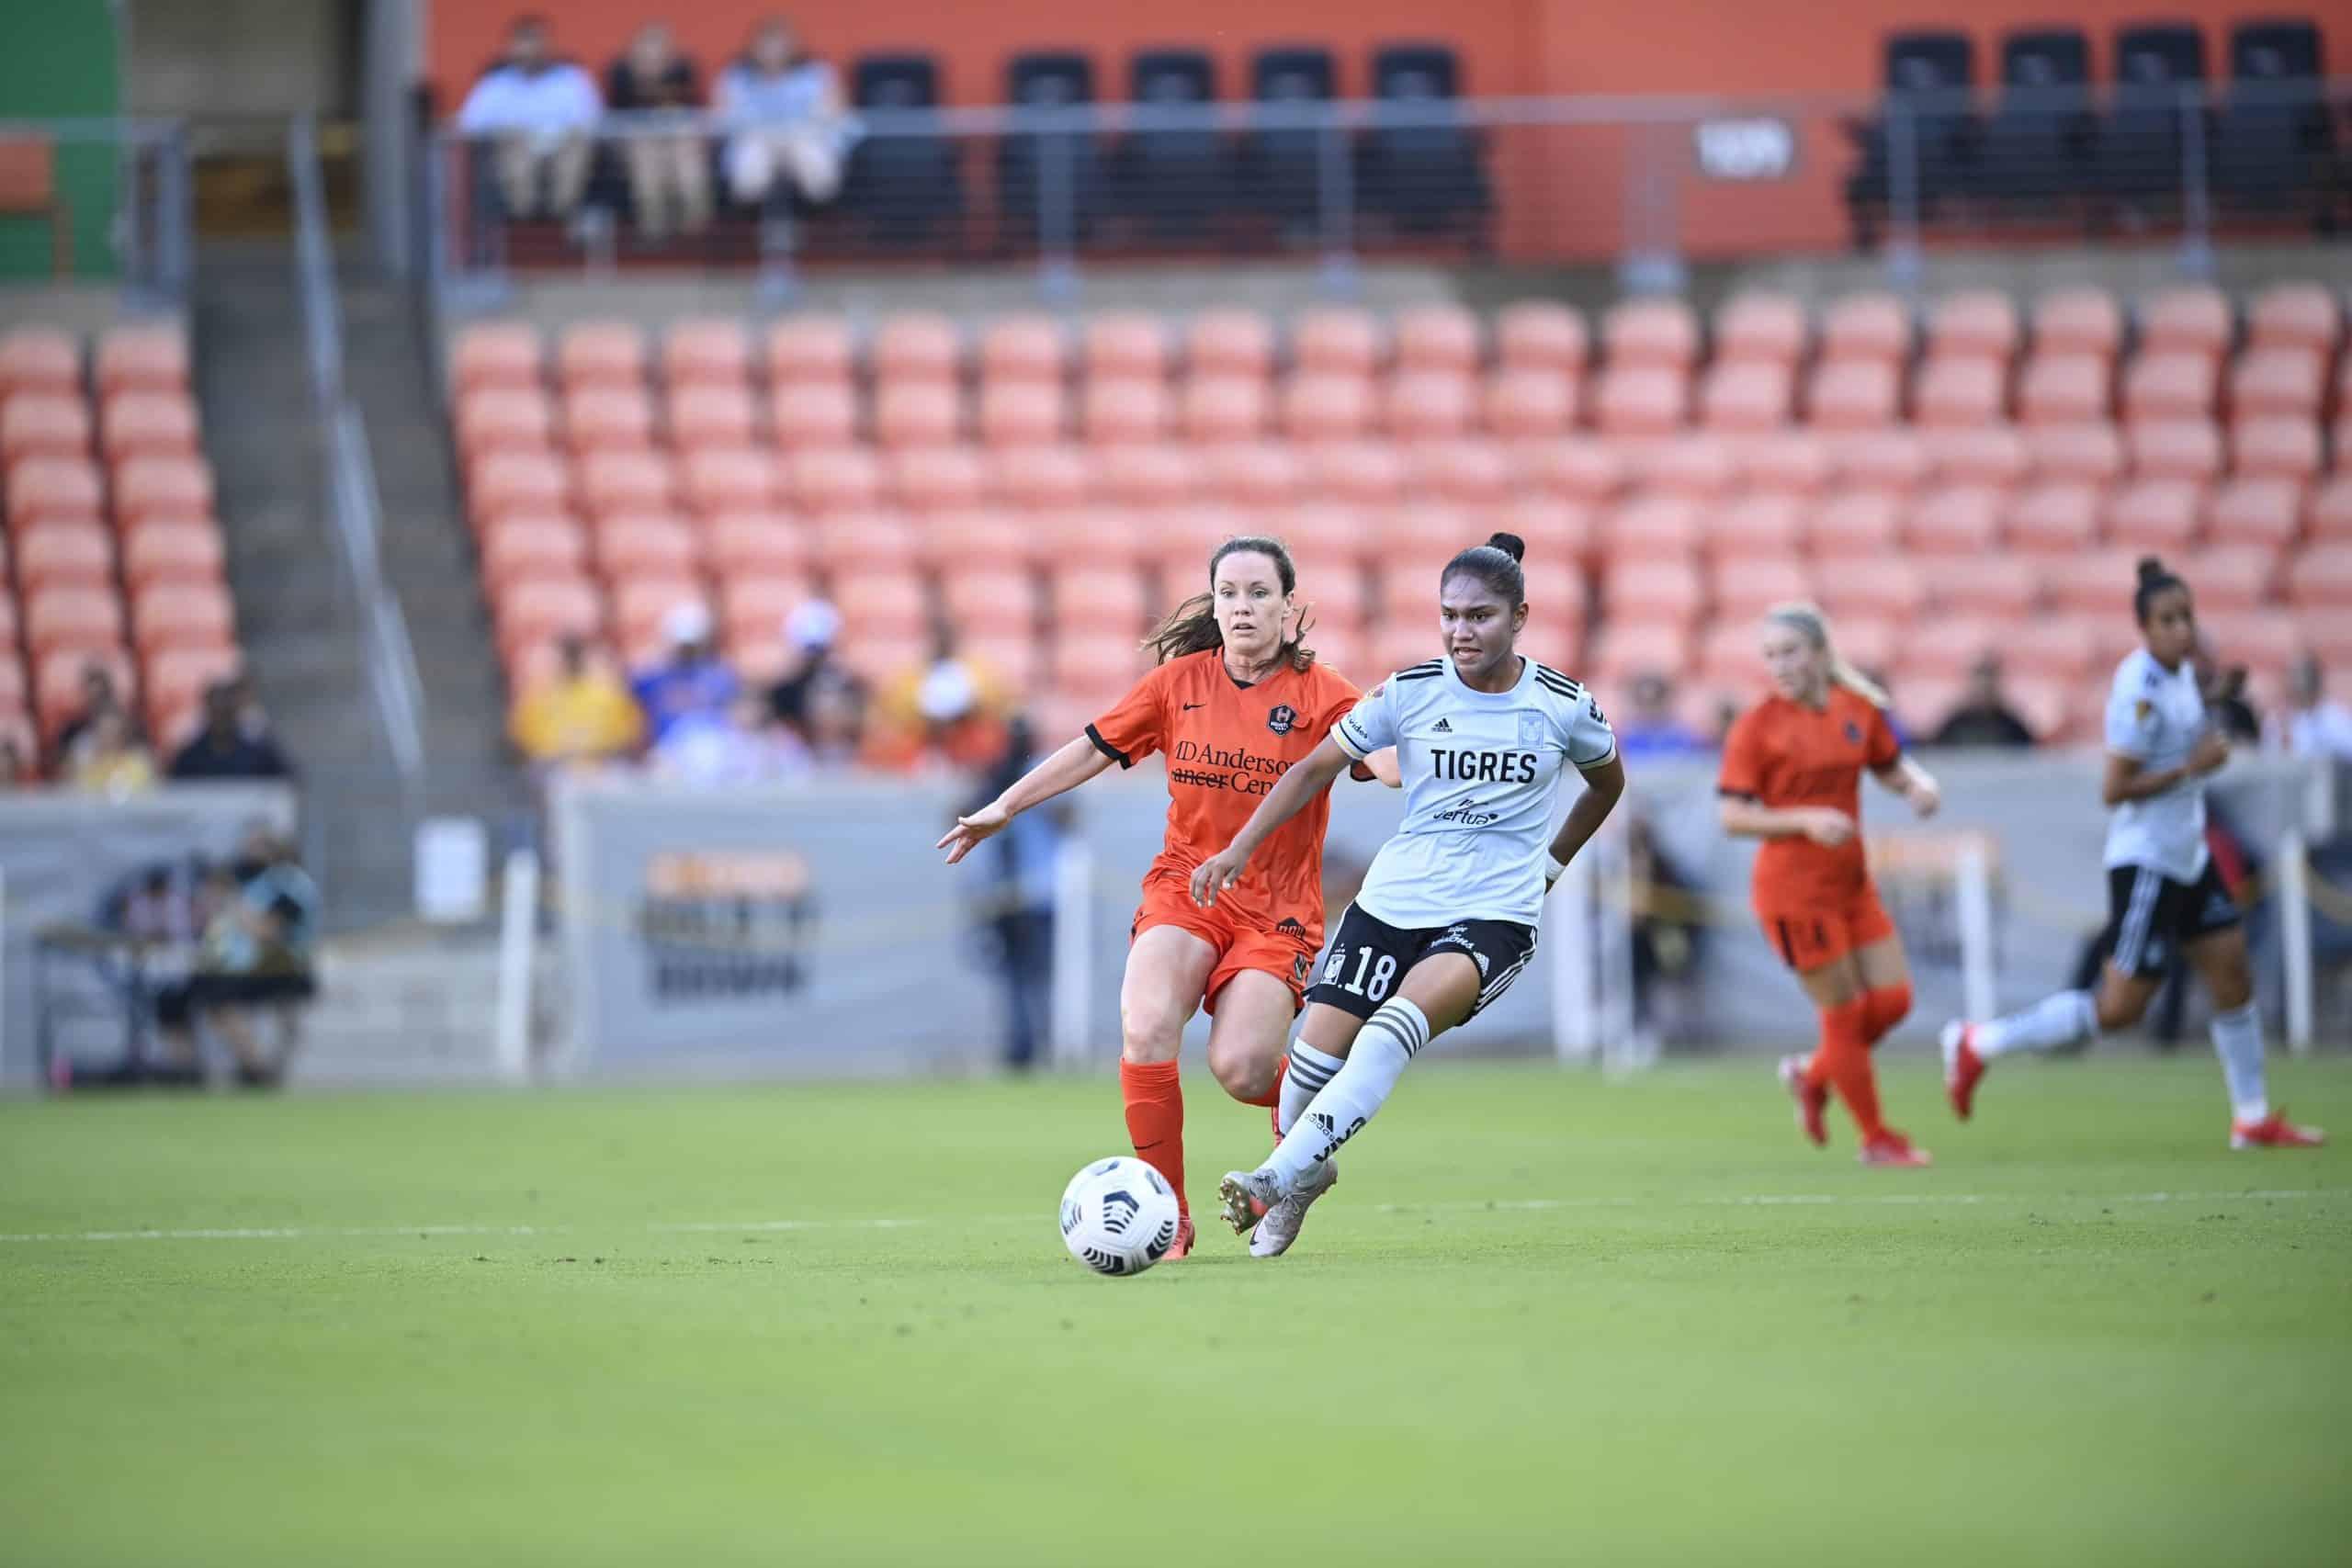 Golean 5-1 a Tigres Femenil ante el Houston Dash